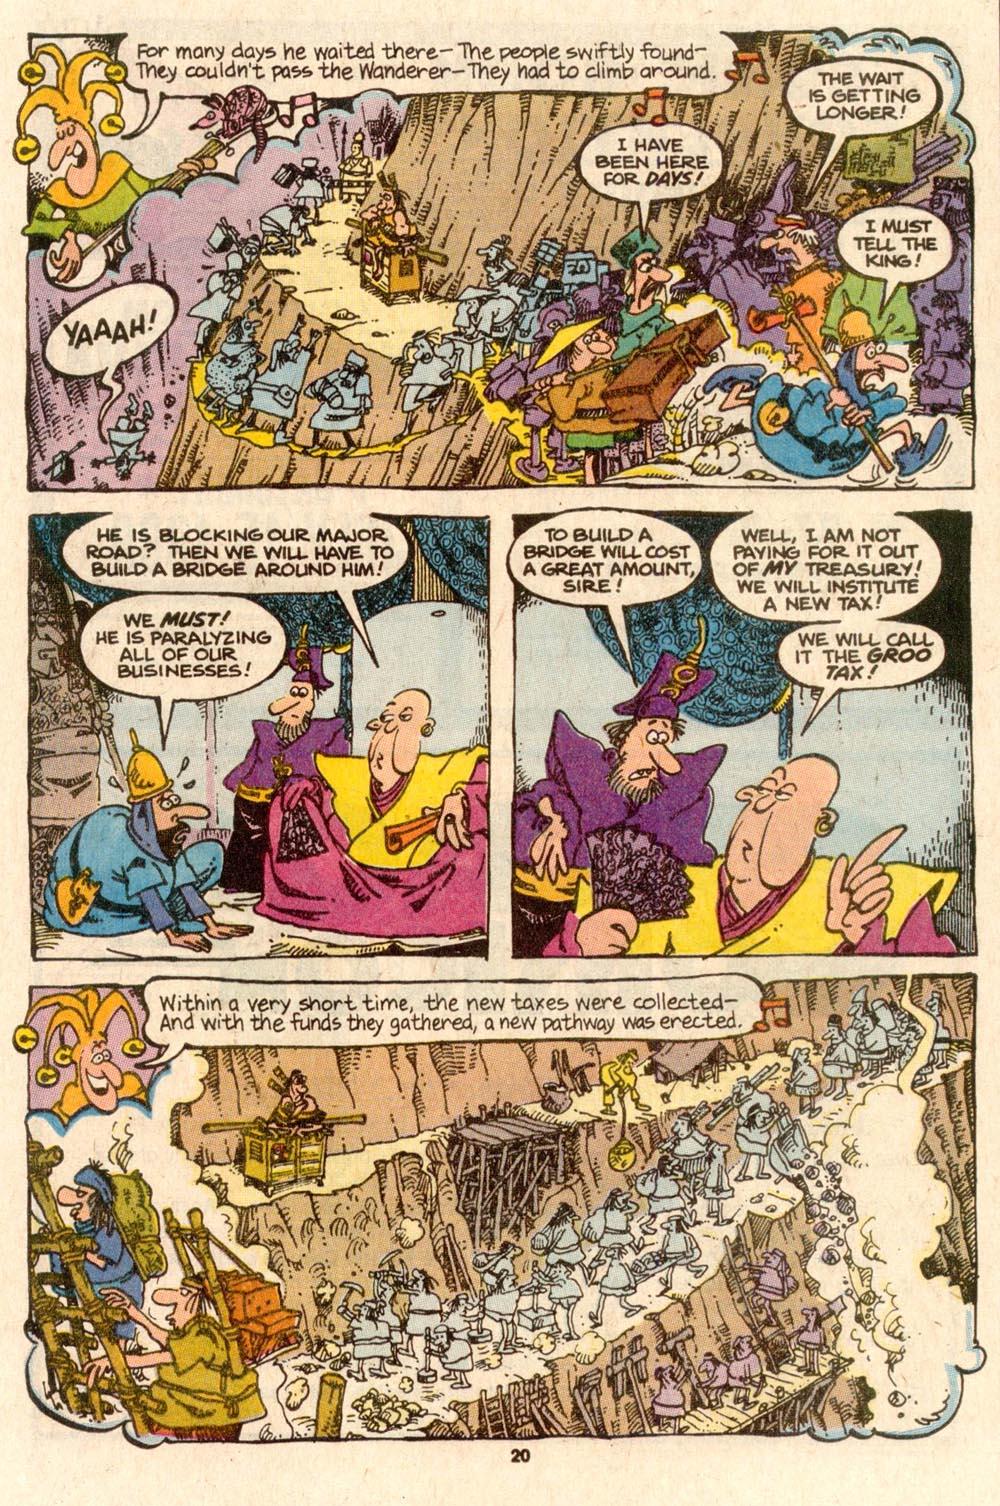 Read online Sergio Aragonés Groo the Wanderer comic -  Issue #56 - 20